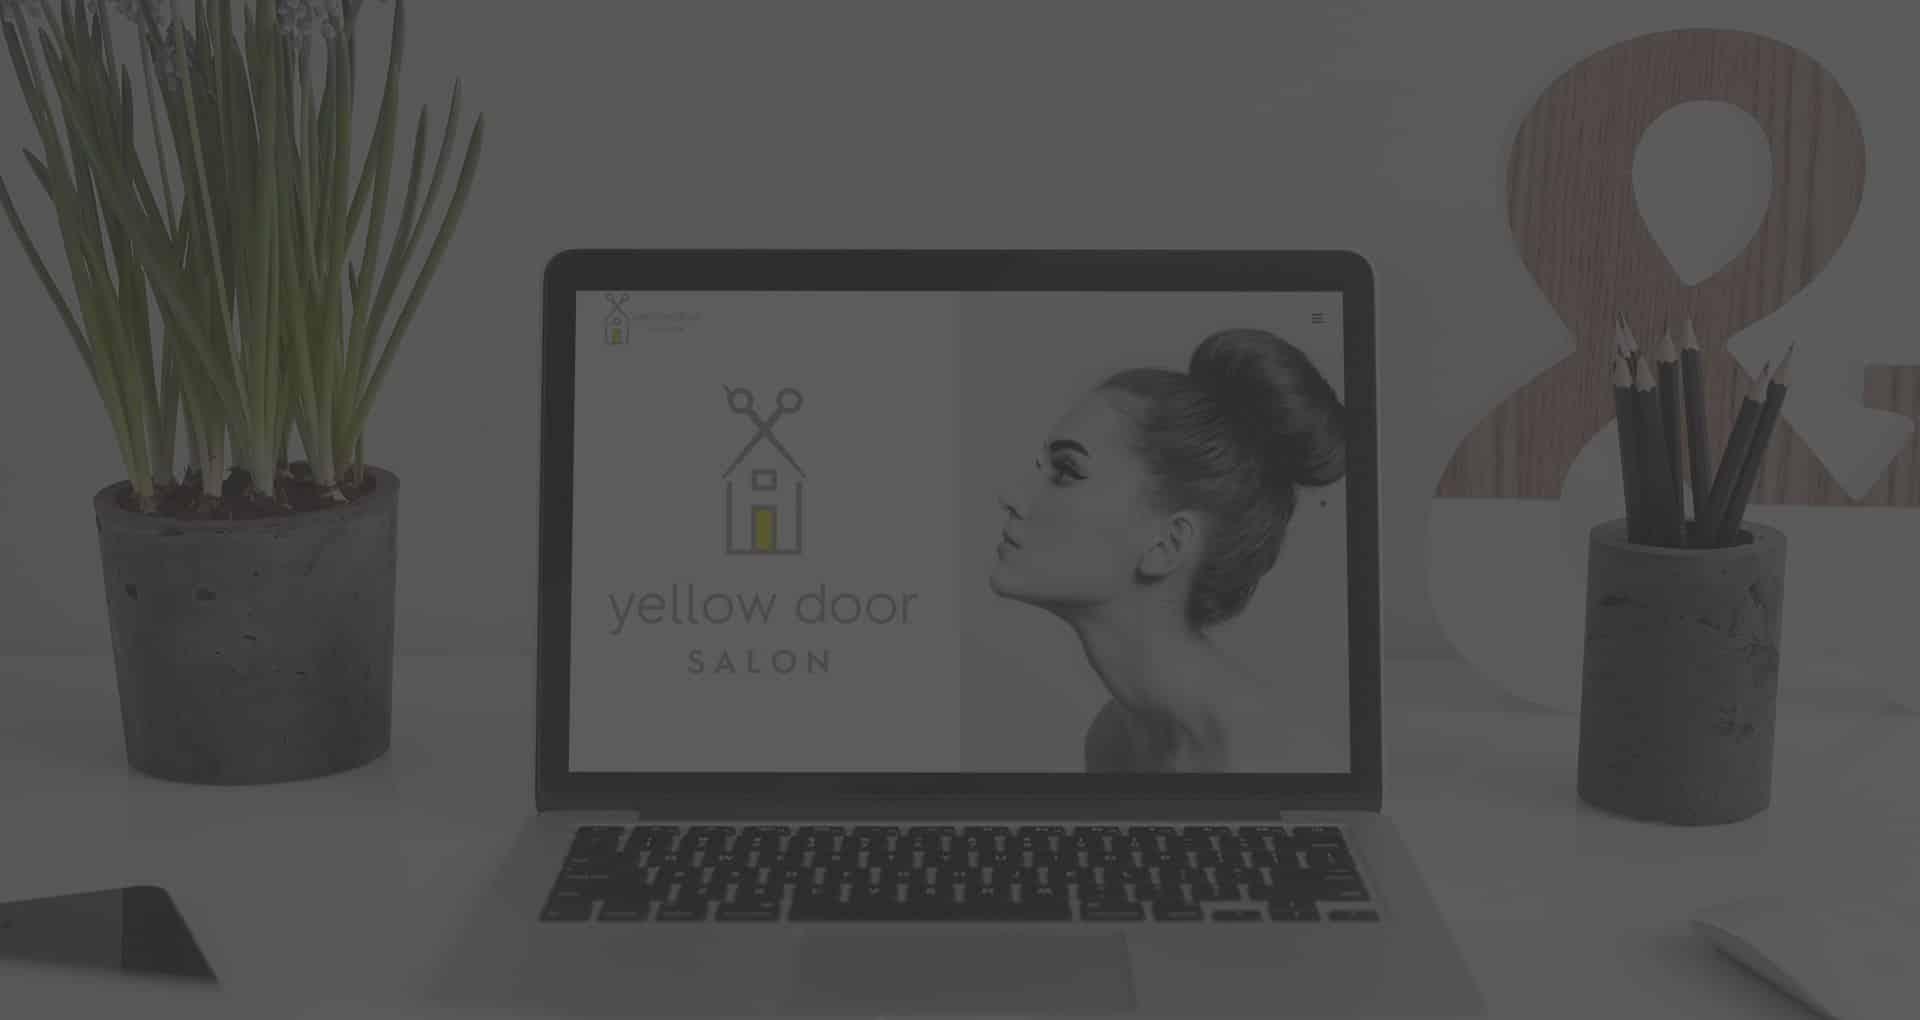 Restaurant Web Design Agency in Austin, TX - Enlightened Owl Digital